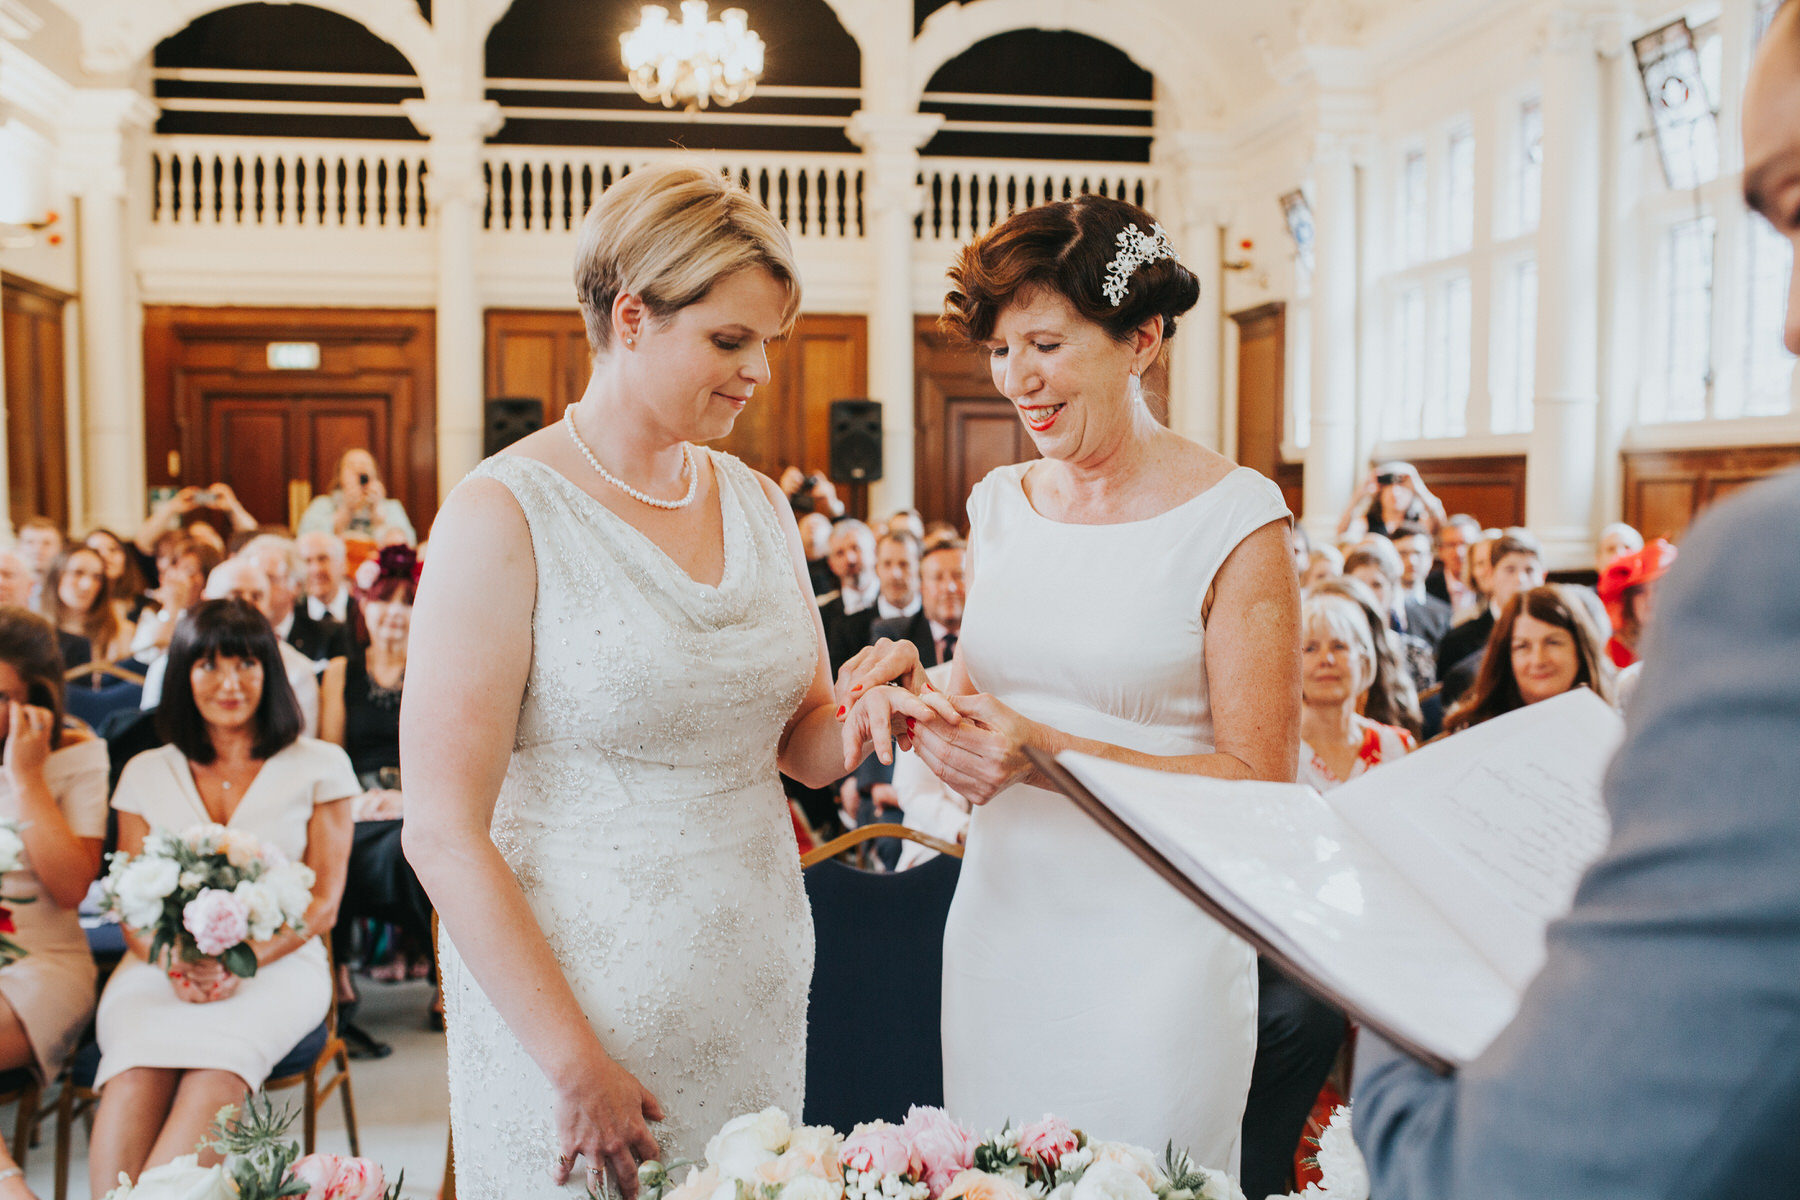 108 Islington documentary wedding ceremony two brides.jpg